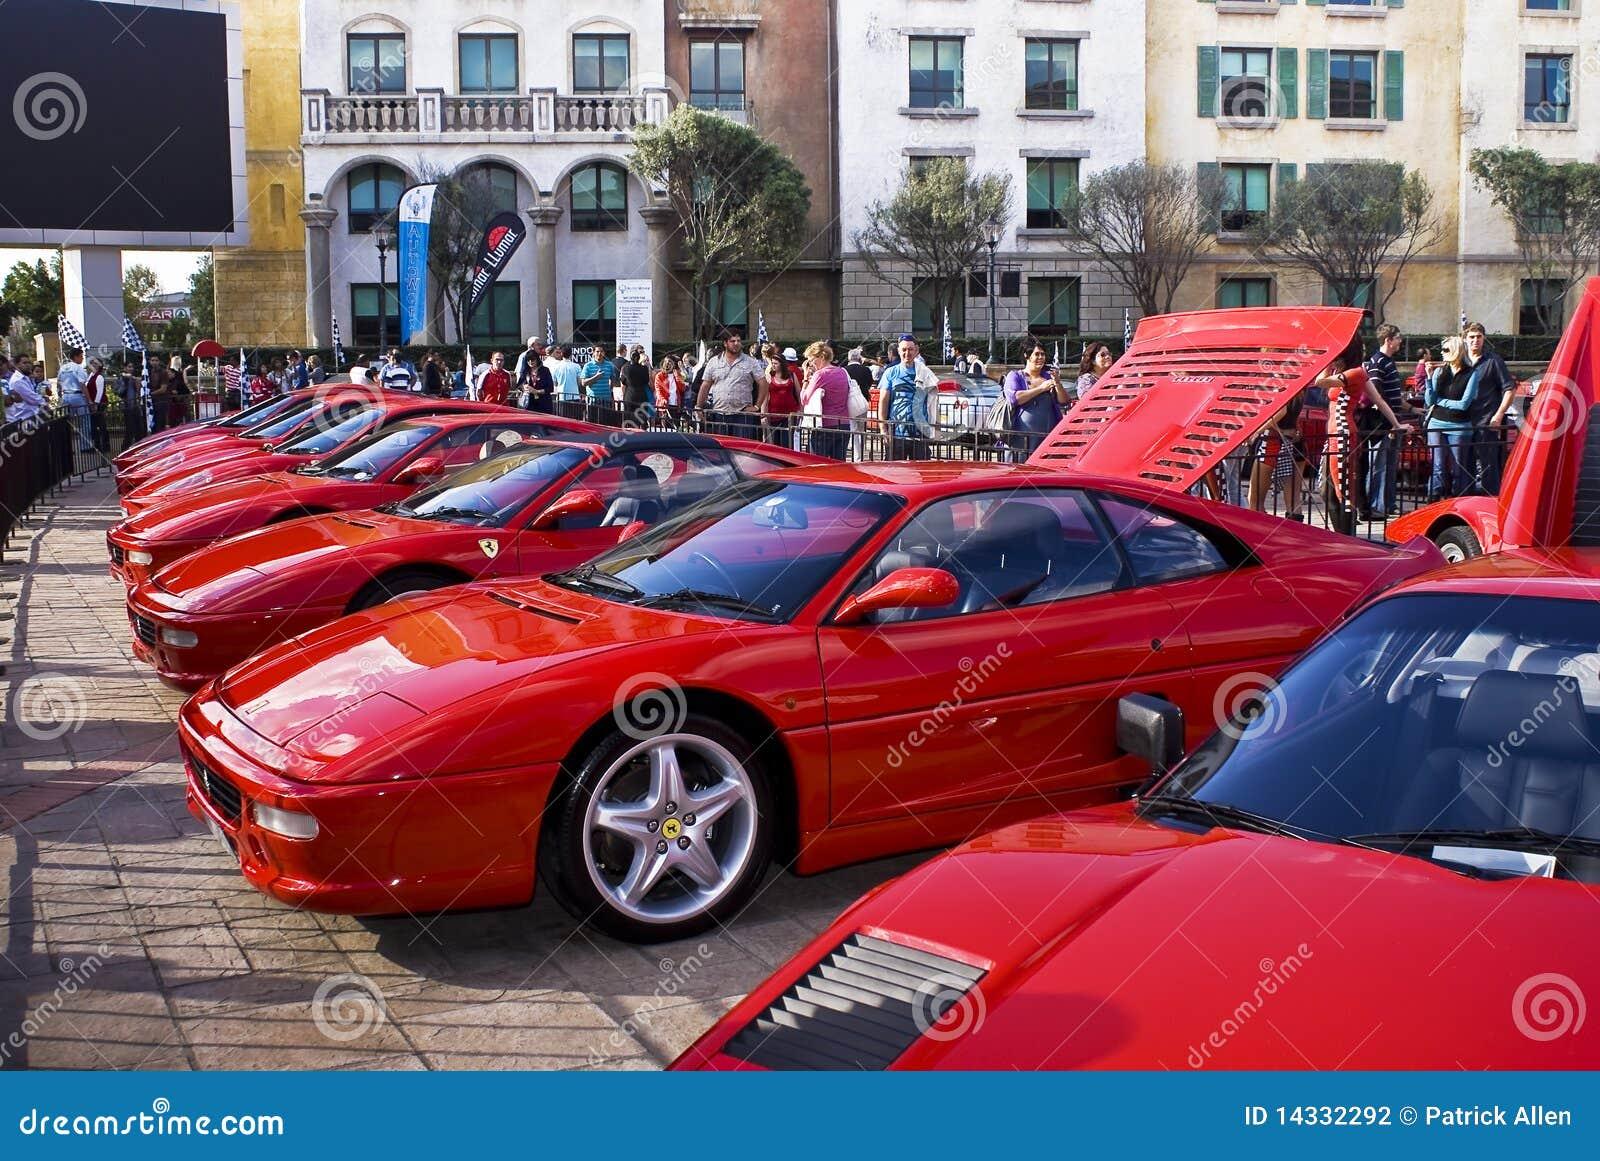 Ferrari Show Day 355 F1 Berlinetta Editorial Photography